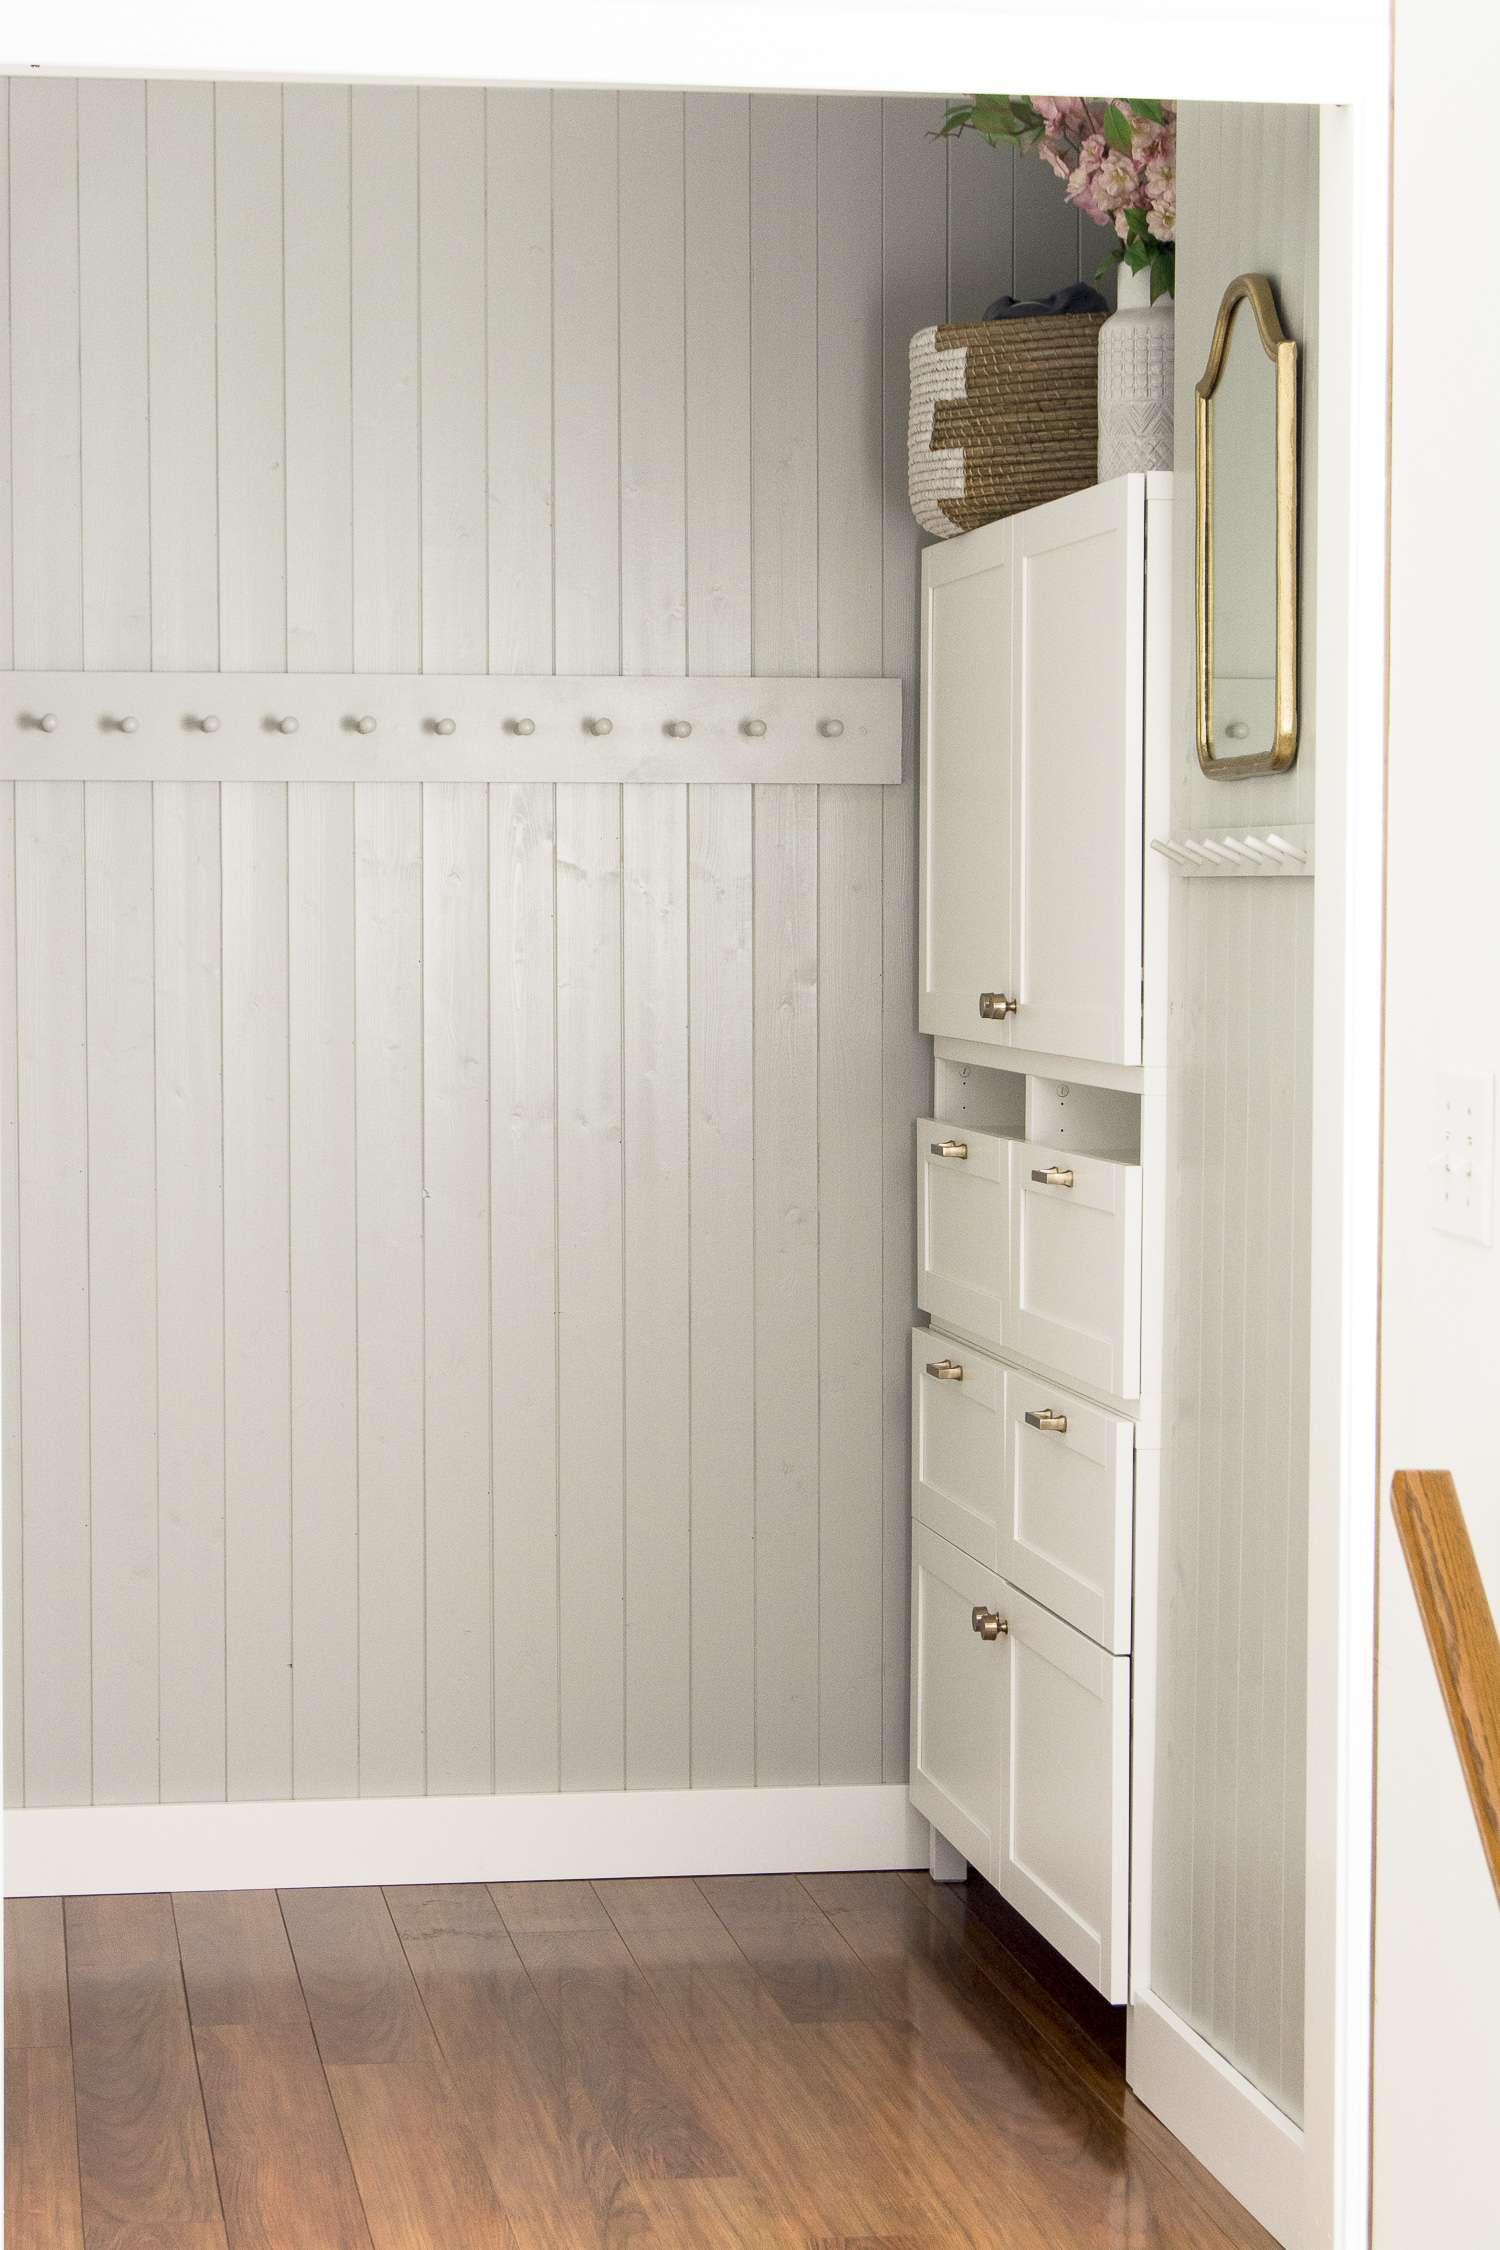 Small mudroom storage ideas.